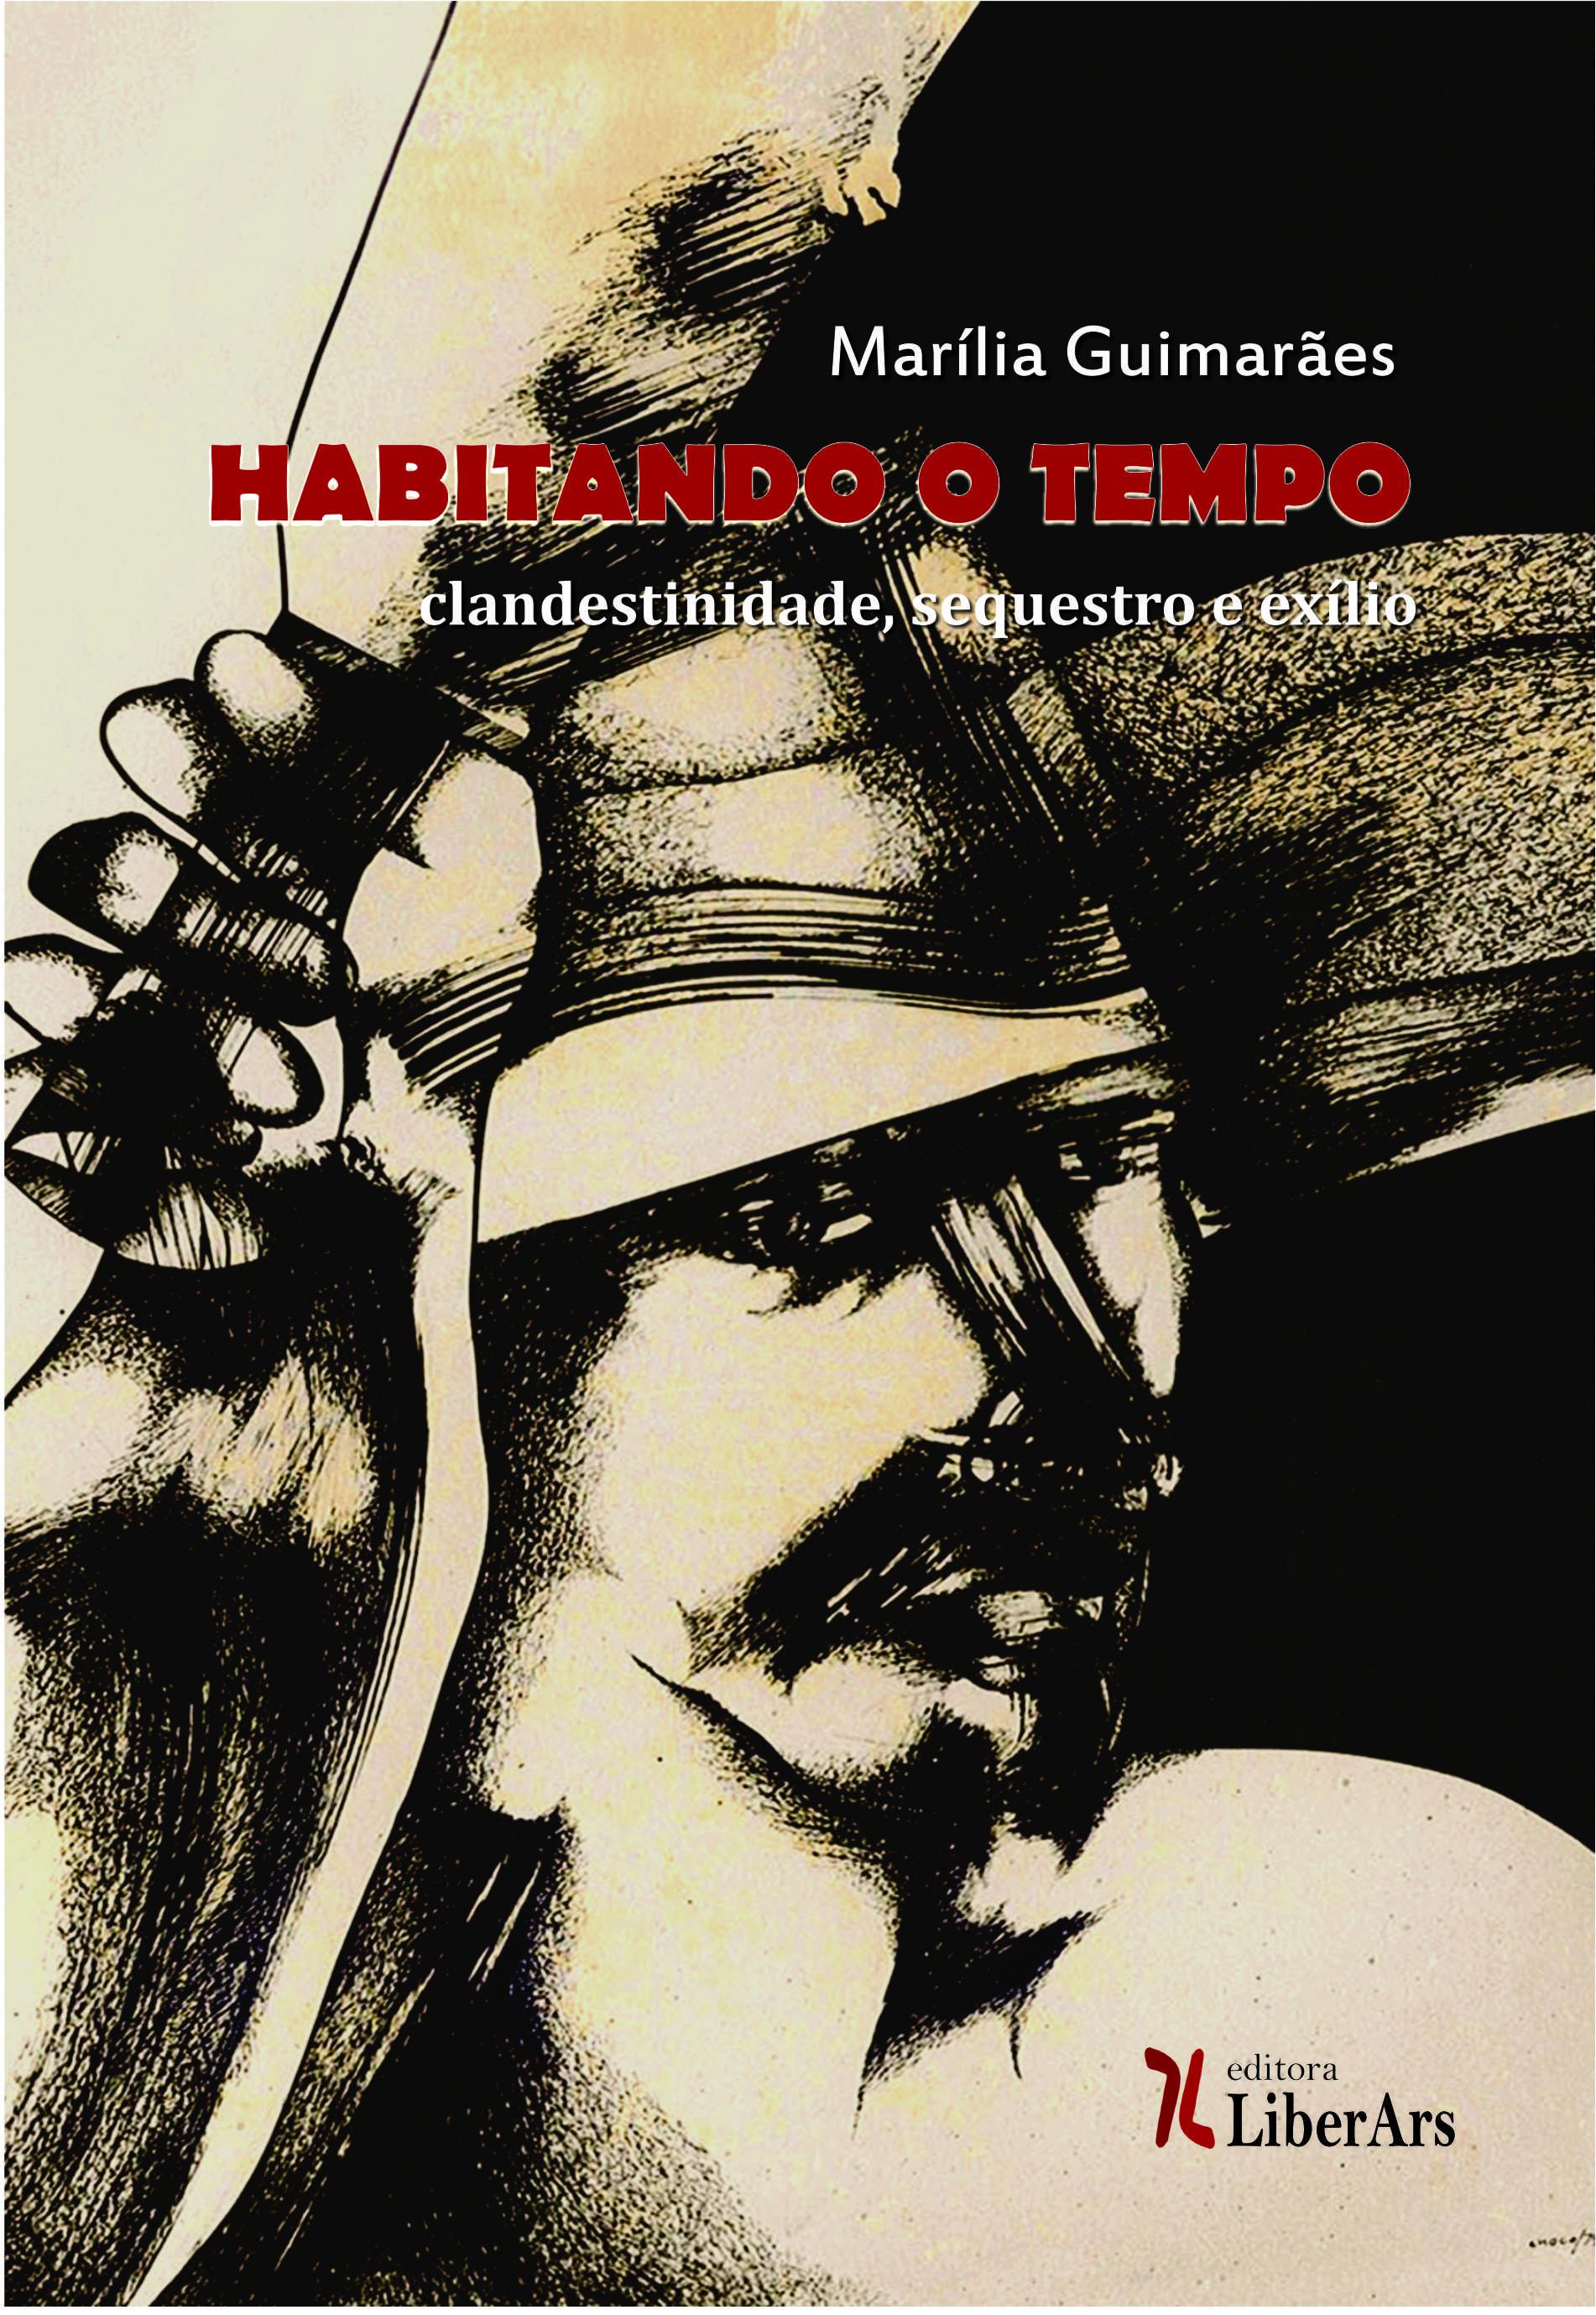 Habitando o tempo: clandestinidade, sequestro e exílio, livro de Marília Guimarães